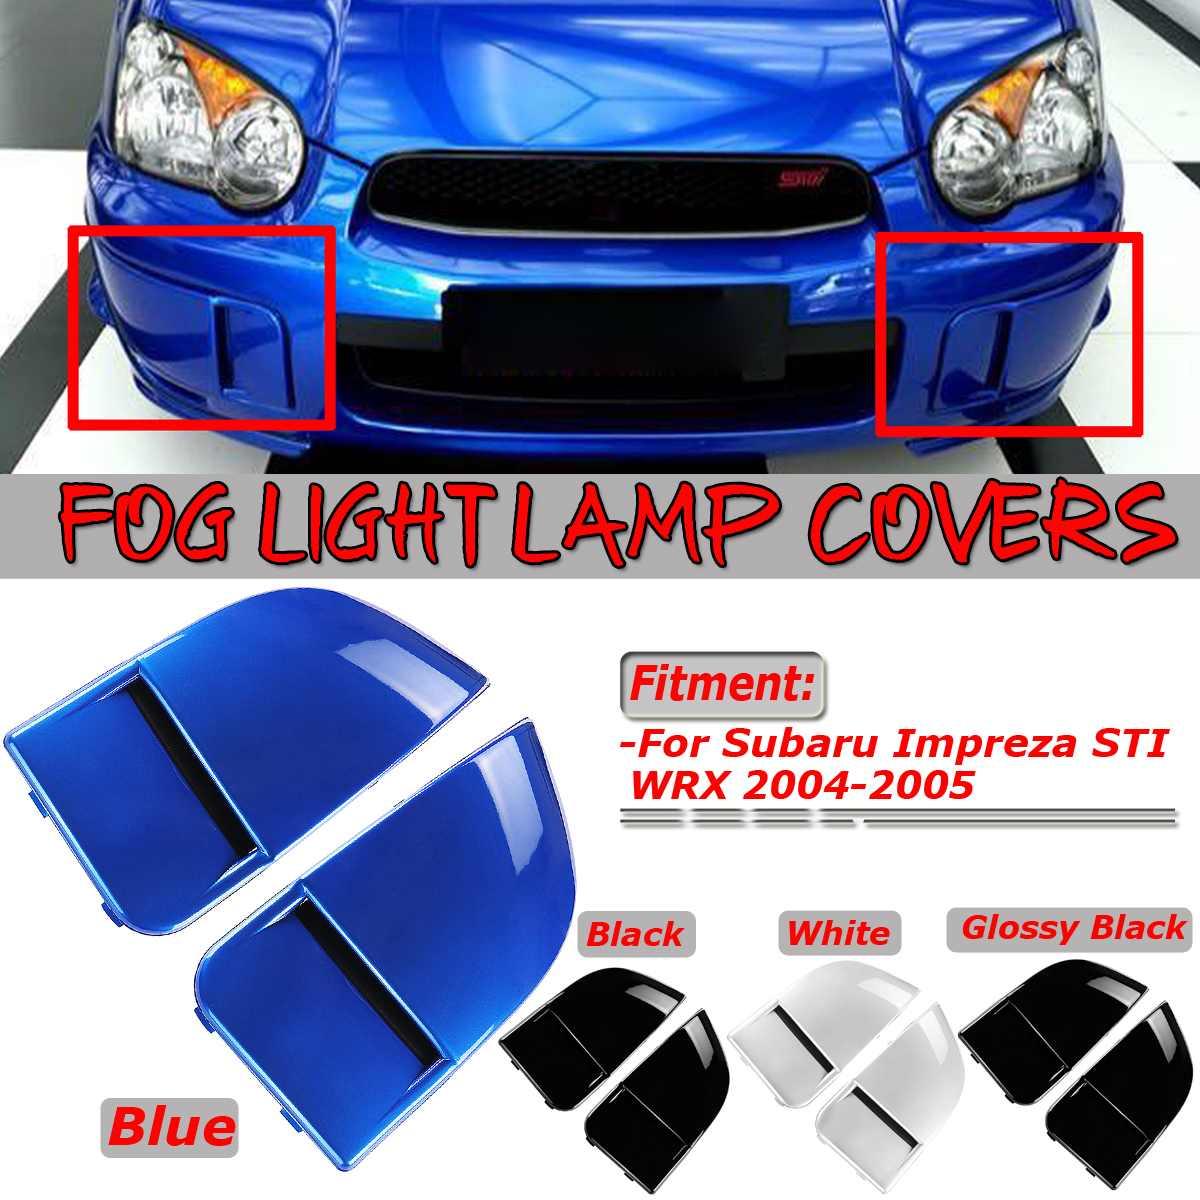 1 Pair Car Front Fog Light Lamp Covers Bumper Cover Cap Trim Protection For Subaru Impreza STI WRX 2004-2005 Car Lamp Mask Cover1 Pair Car Front Fog Light Lamp Covers Bumper Cover Cap Trim Protection For Subaru Impreza STI WRX 2004-2005 Car Lamp Mask Cover